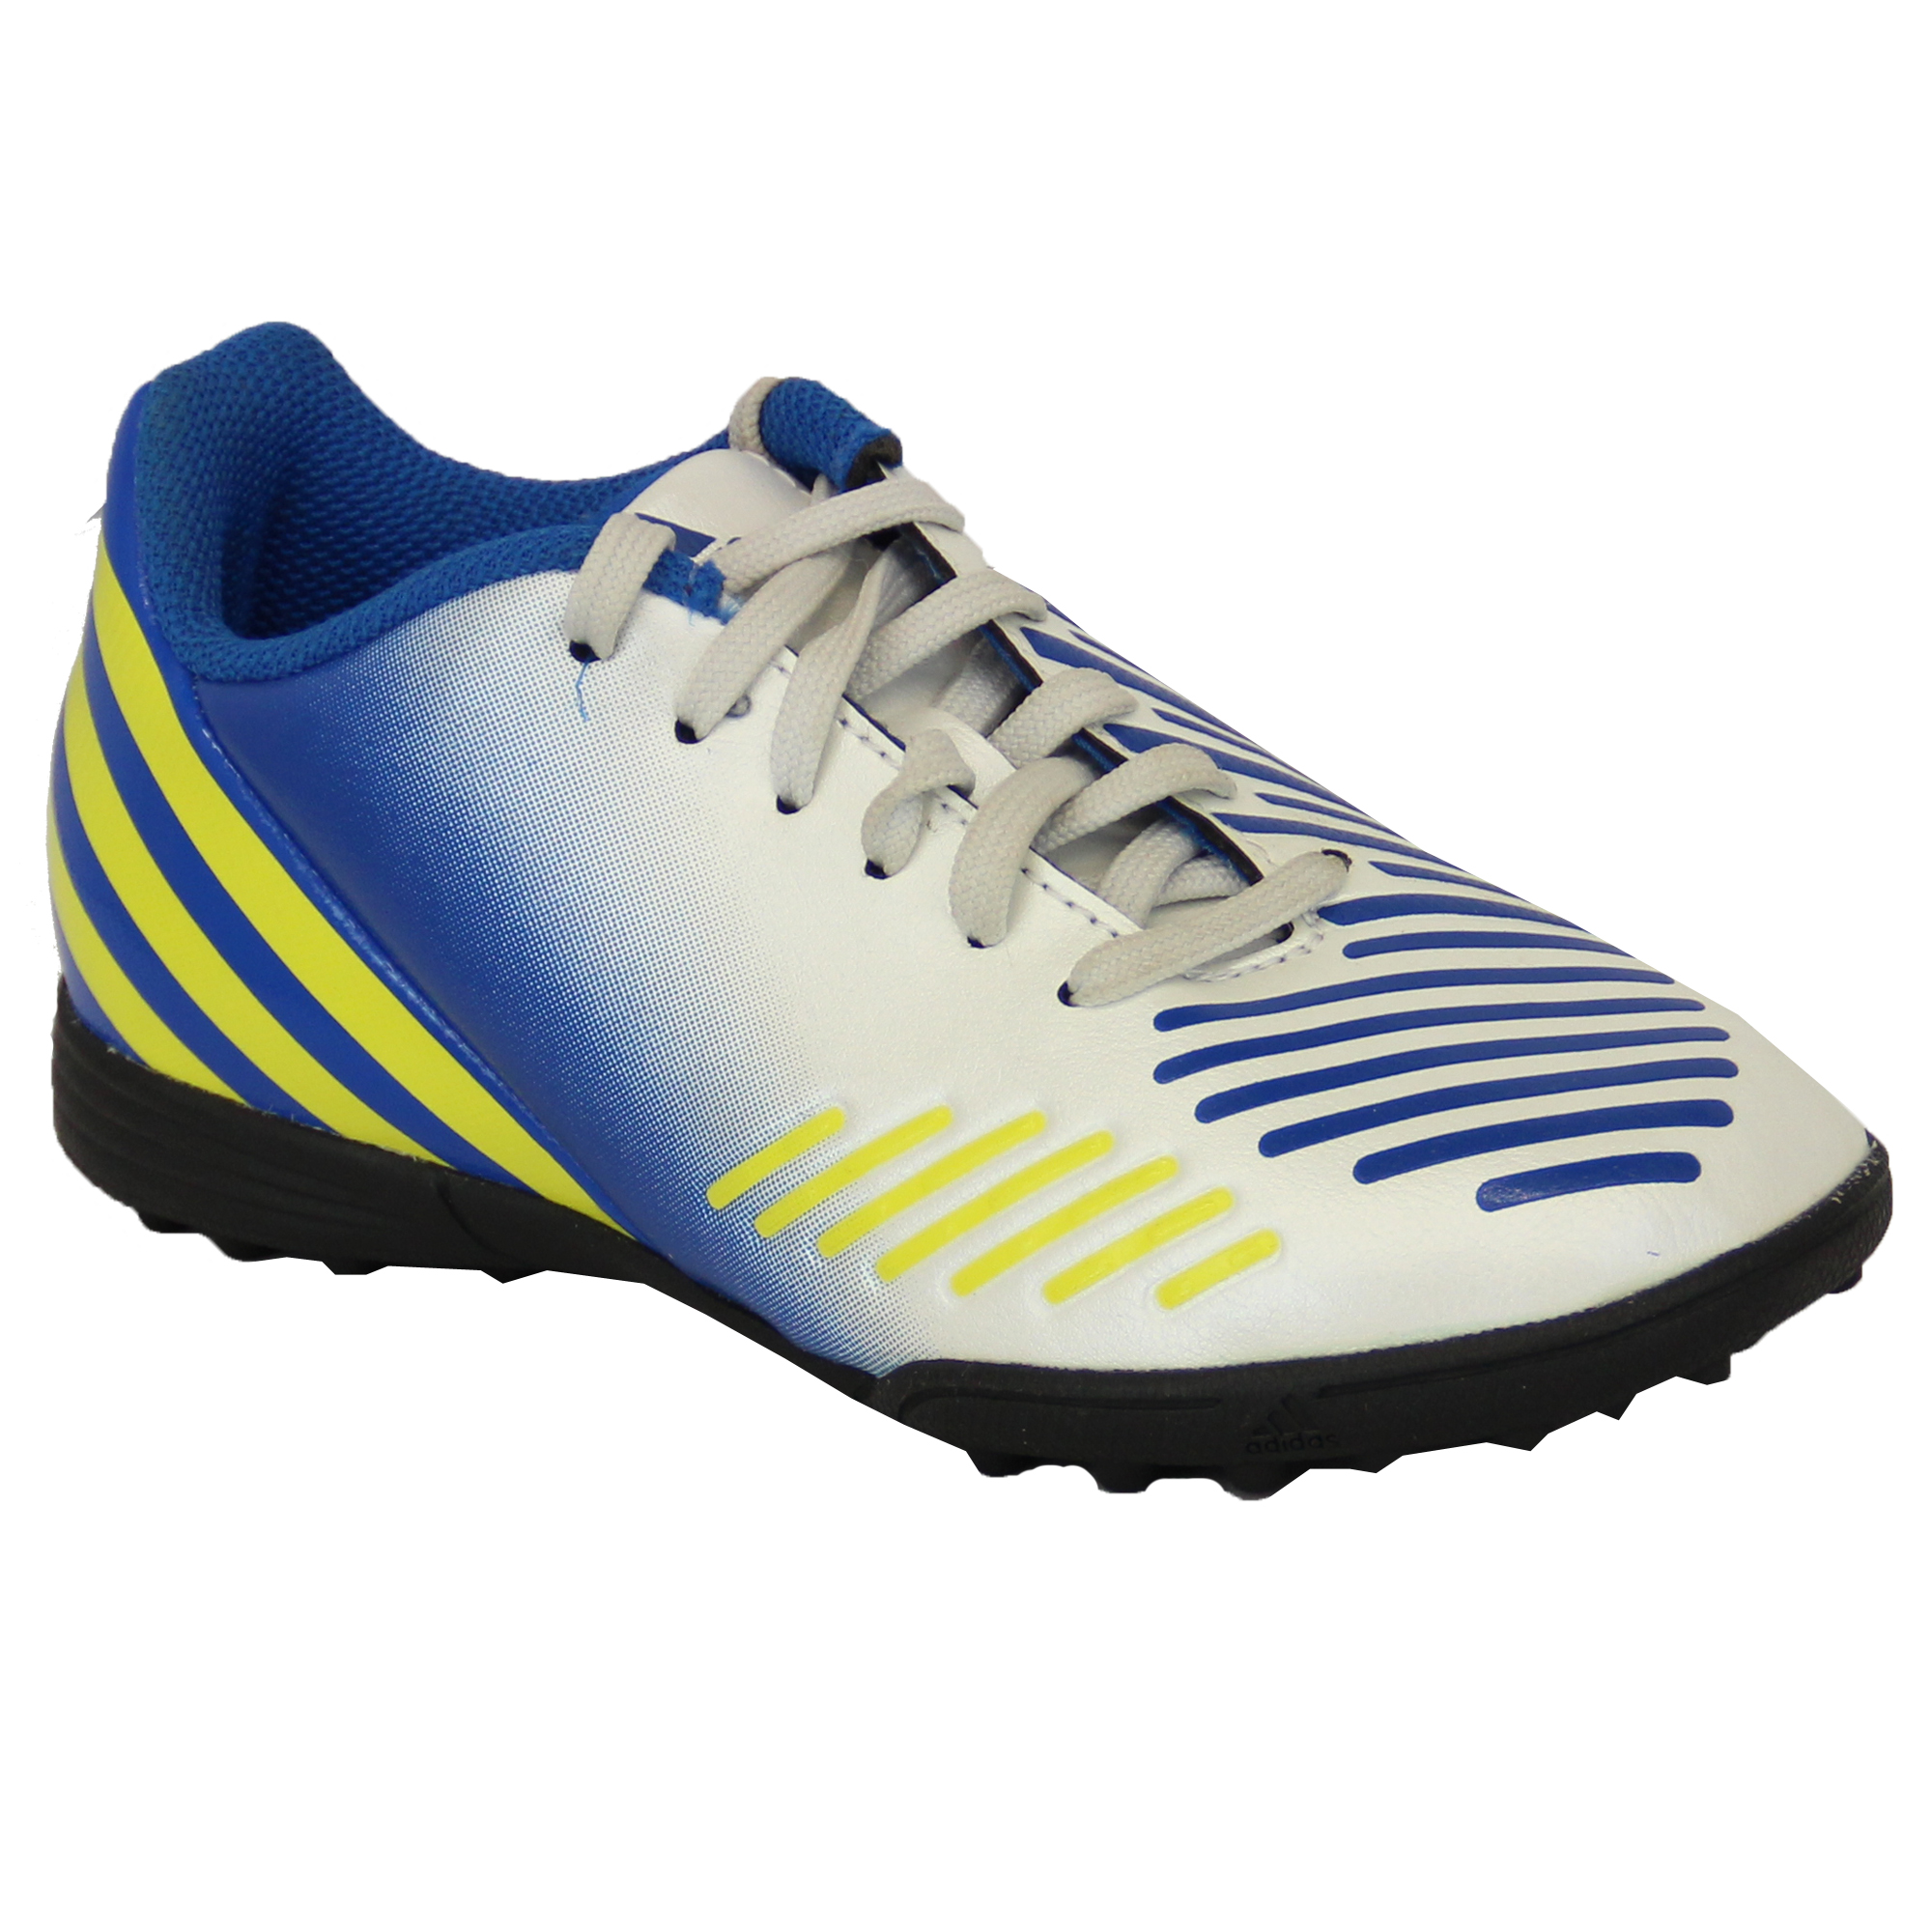 Adidas Soccer Shoes Boys